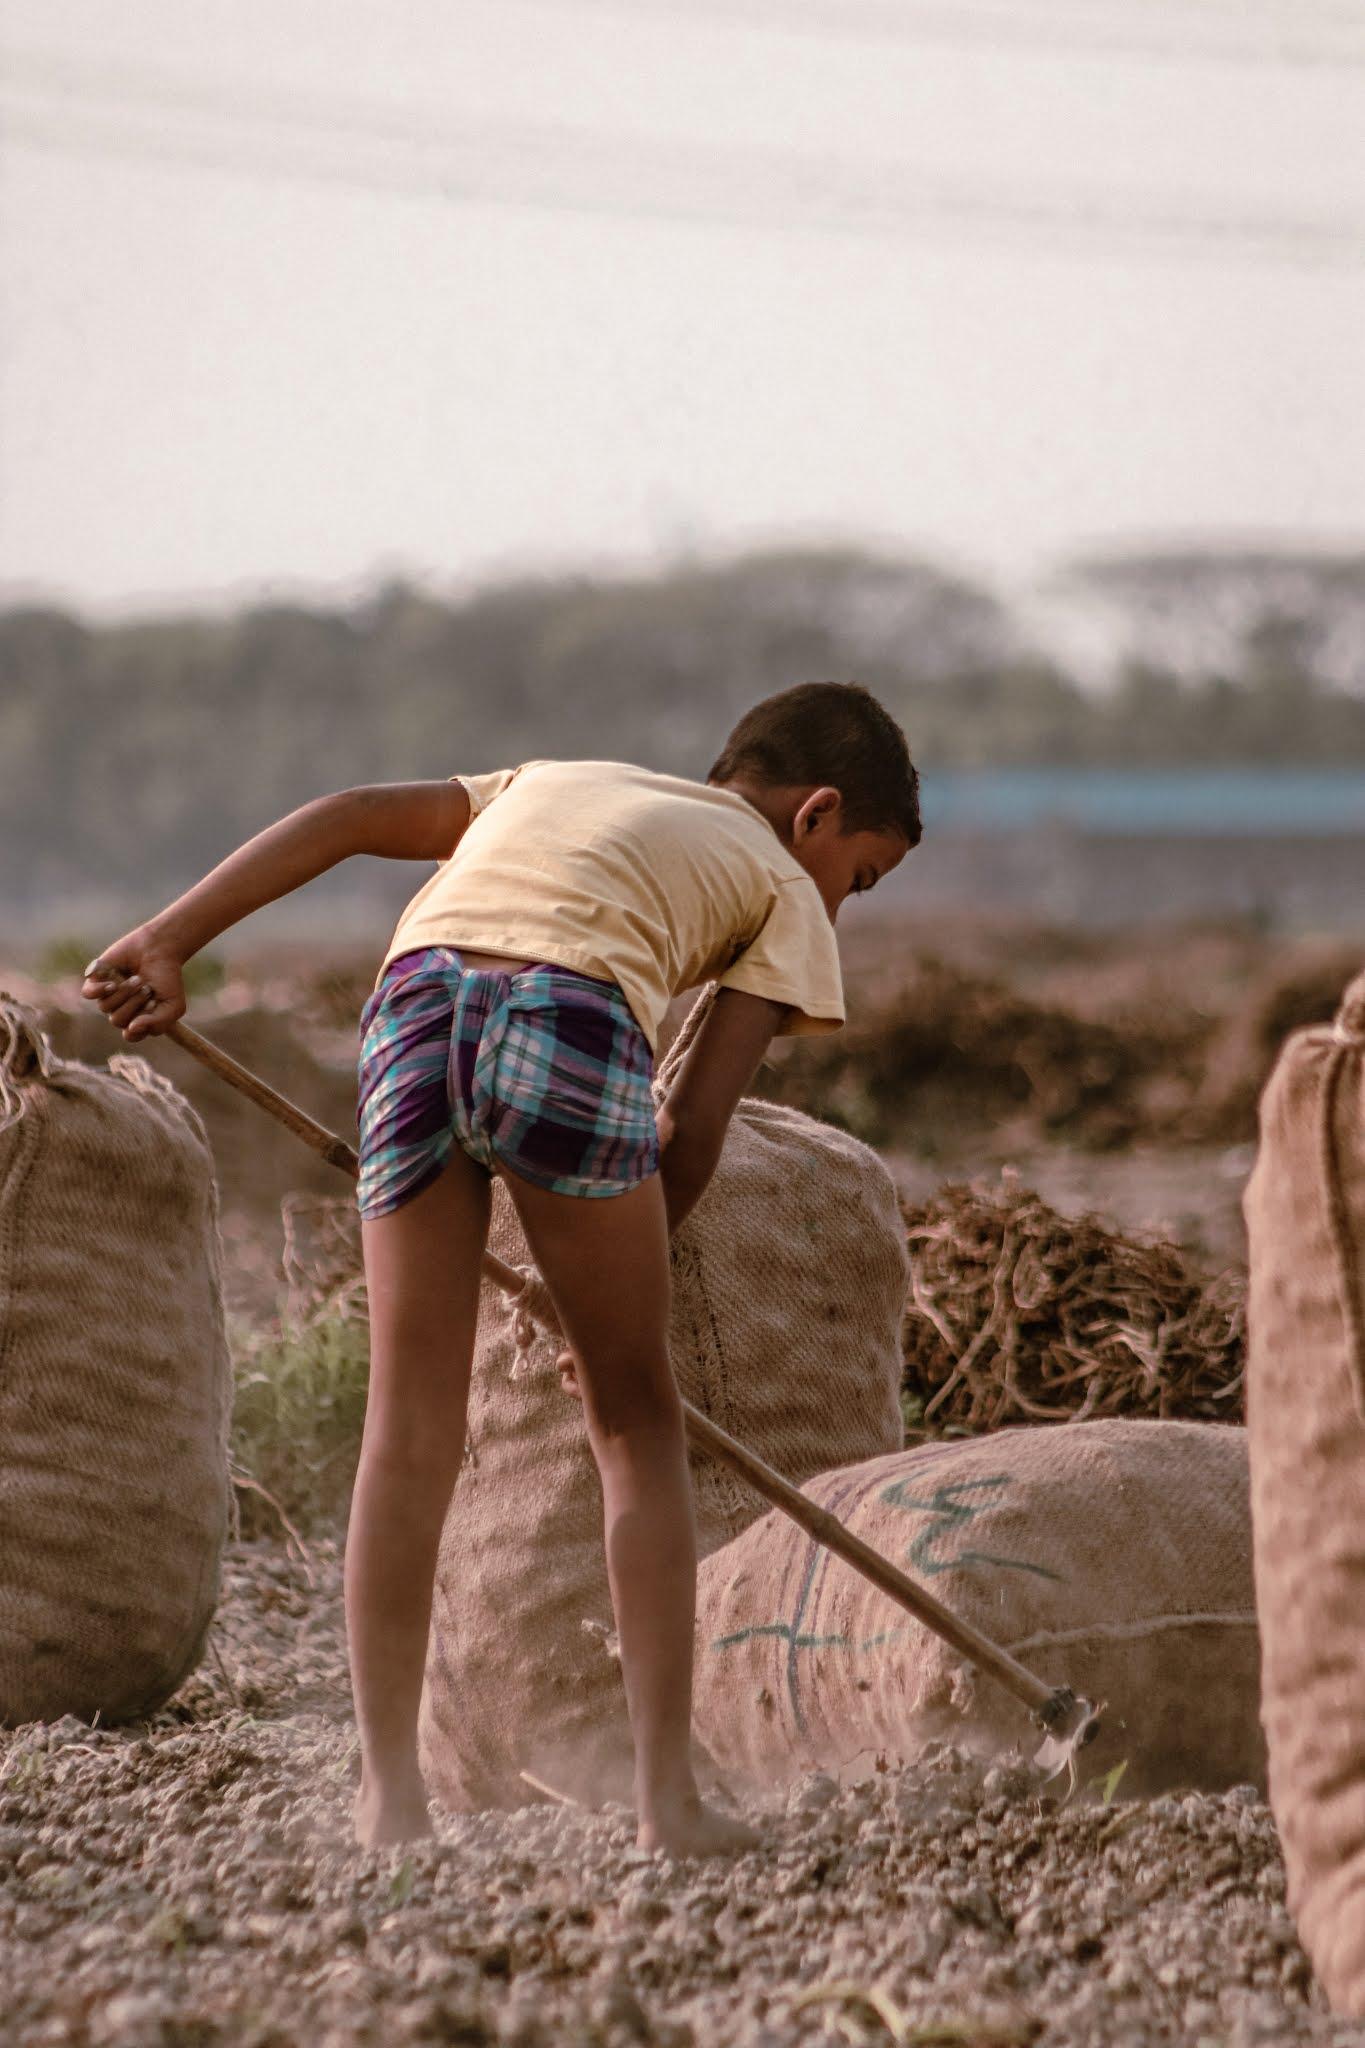 Check essay on child Labour in Hindi | essay on child Labour